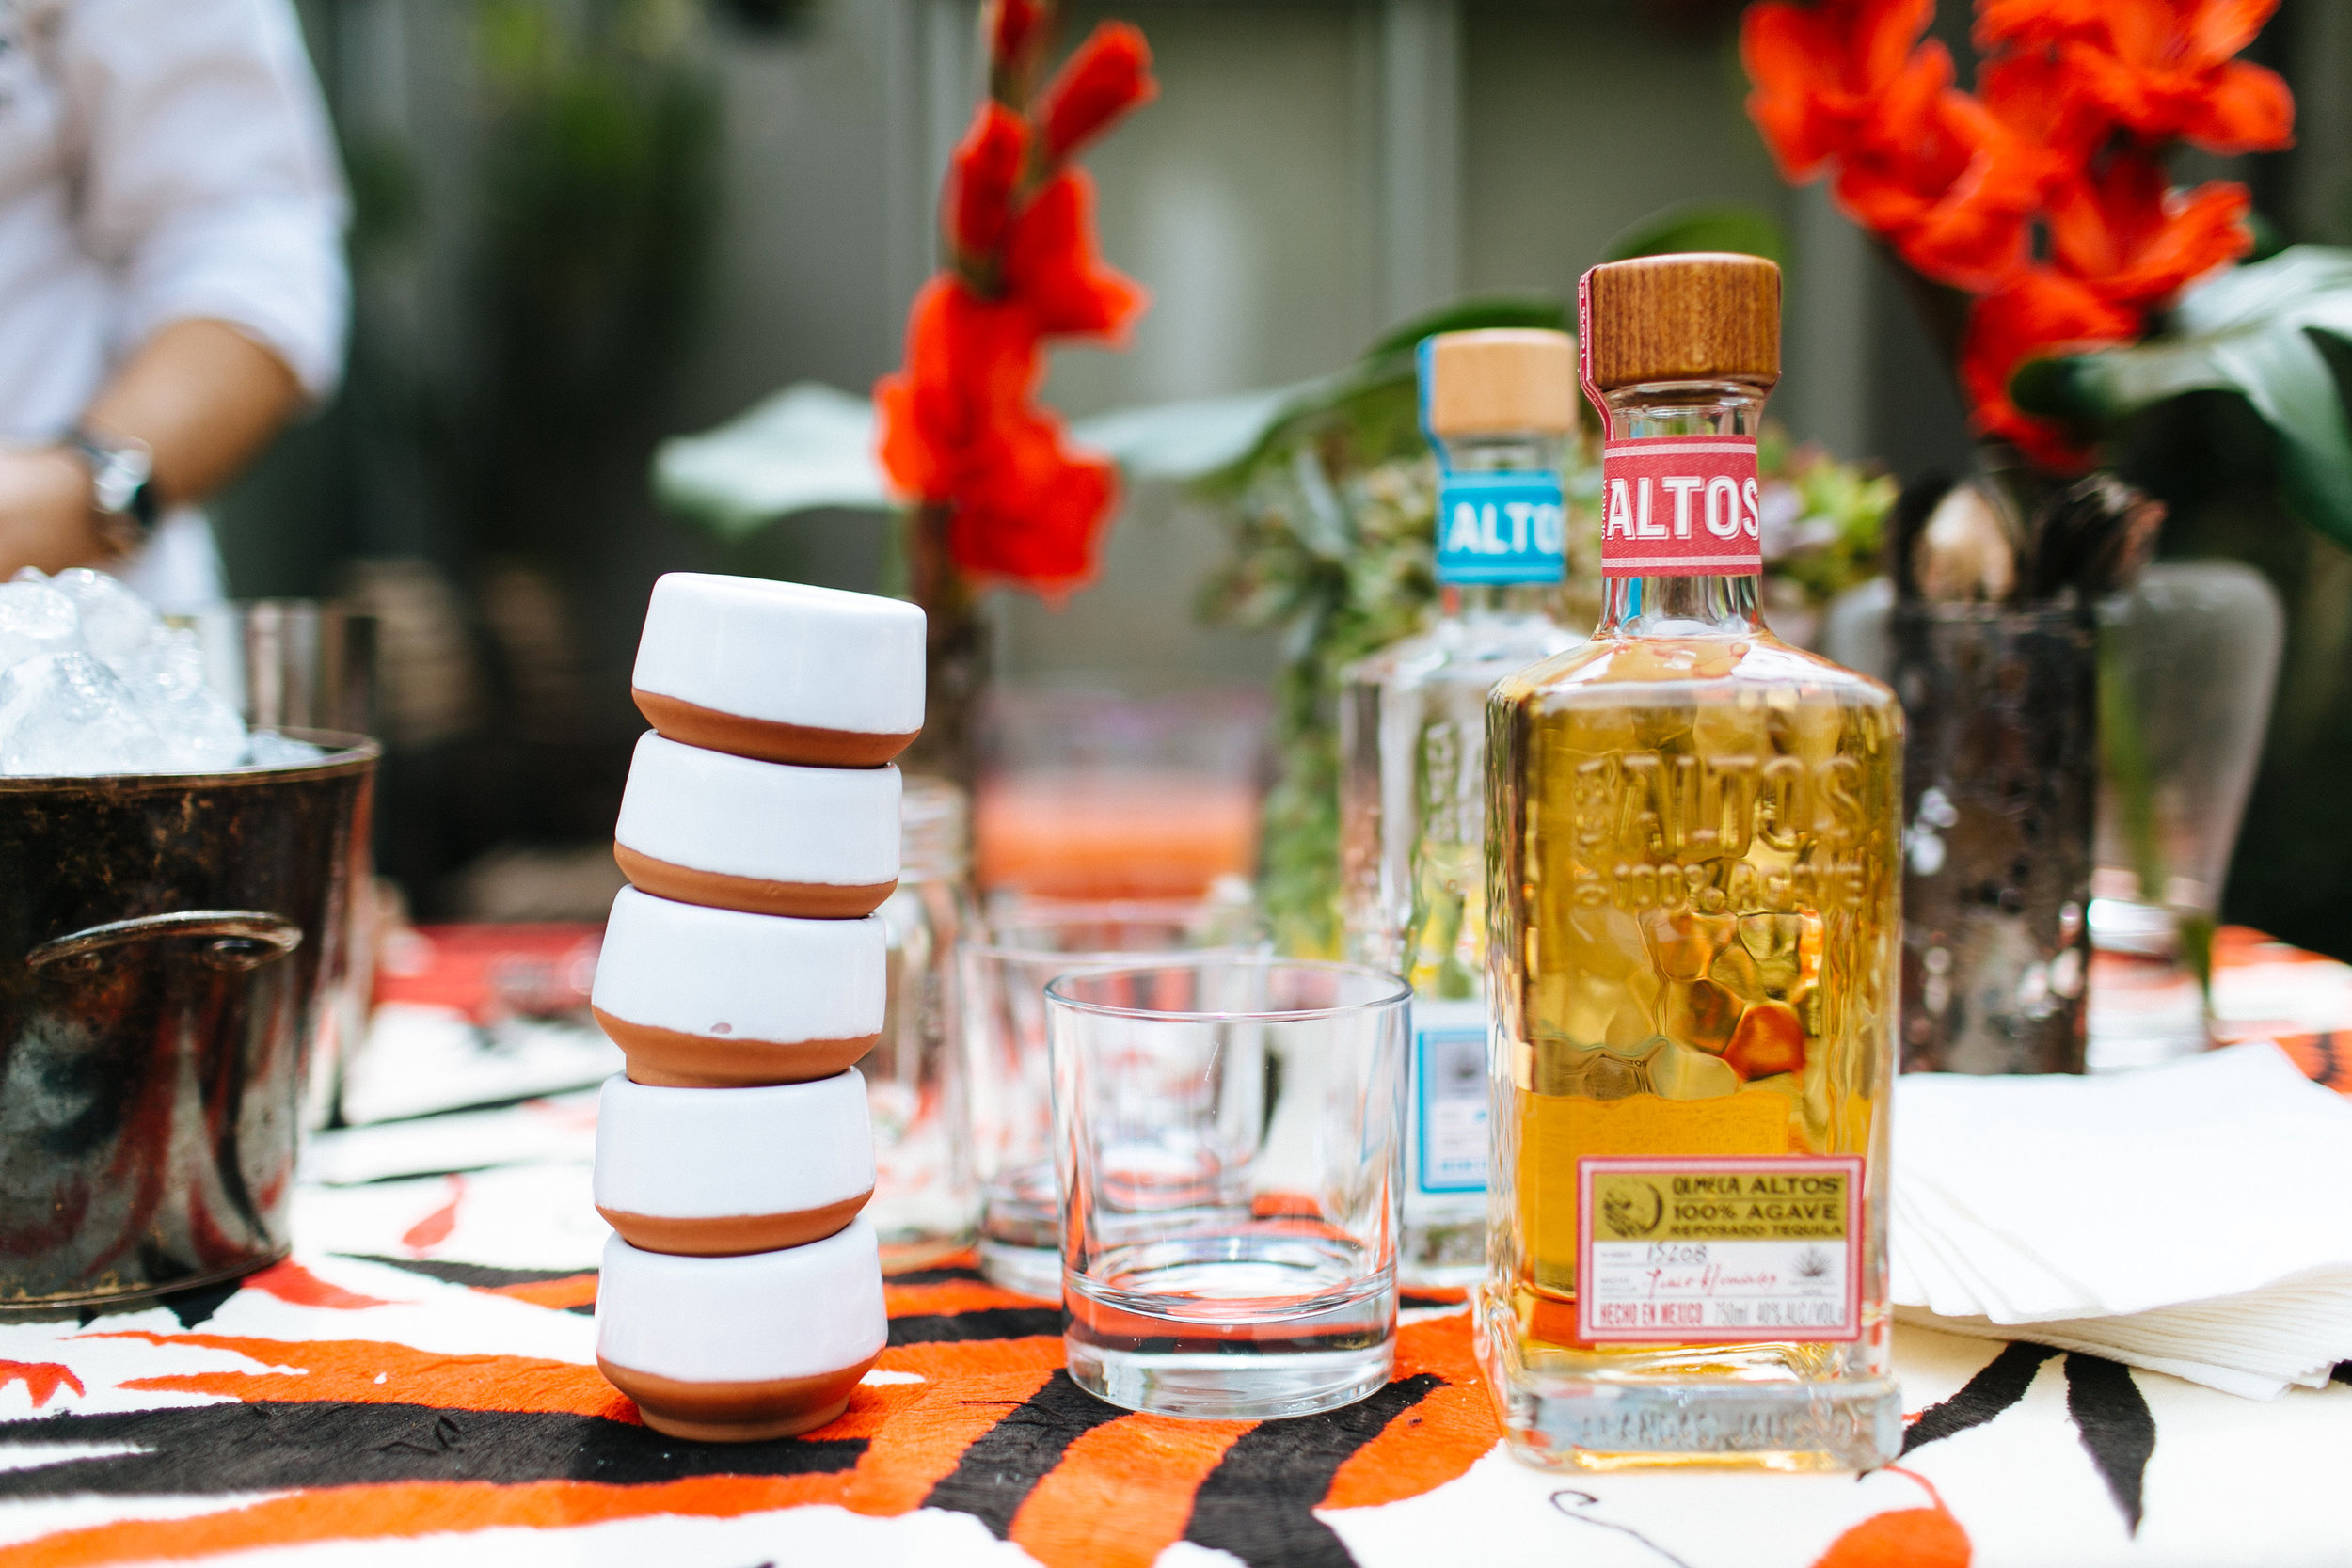 Bottle of Altos tequila at Casa Jacaranda.